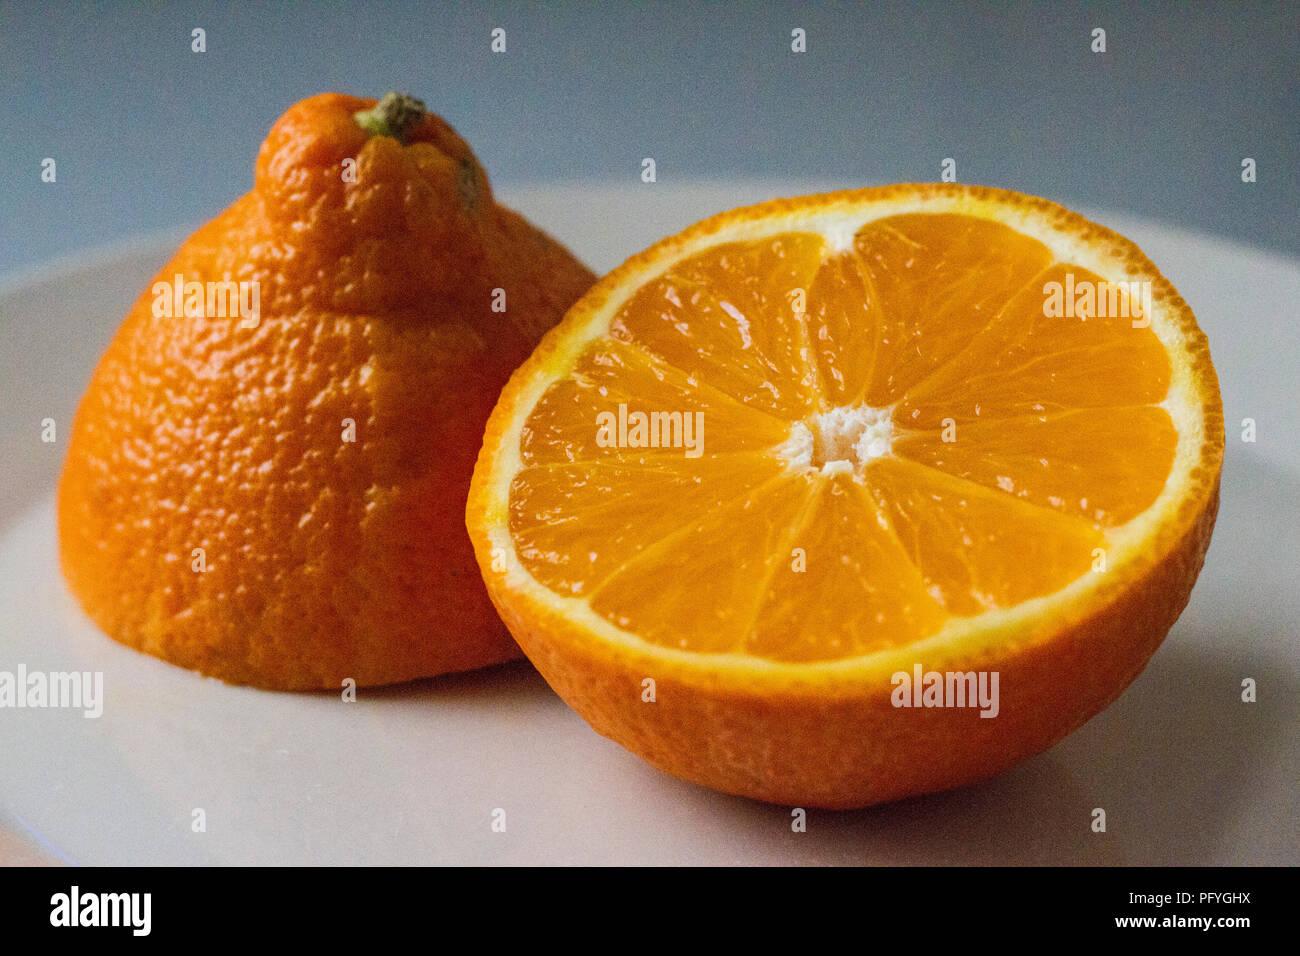 Mineola orange cut in half - Stock Image